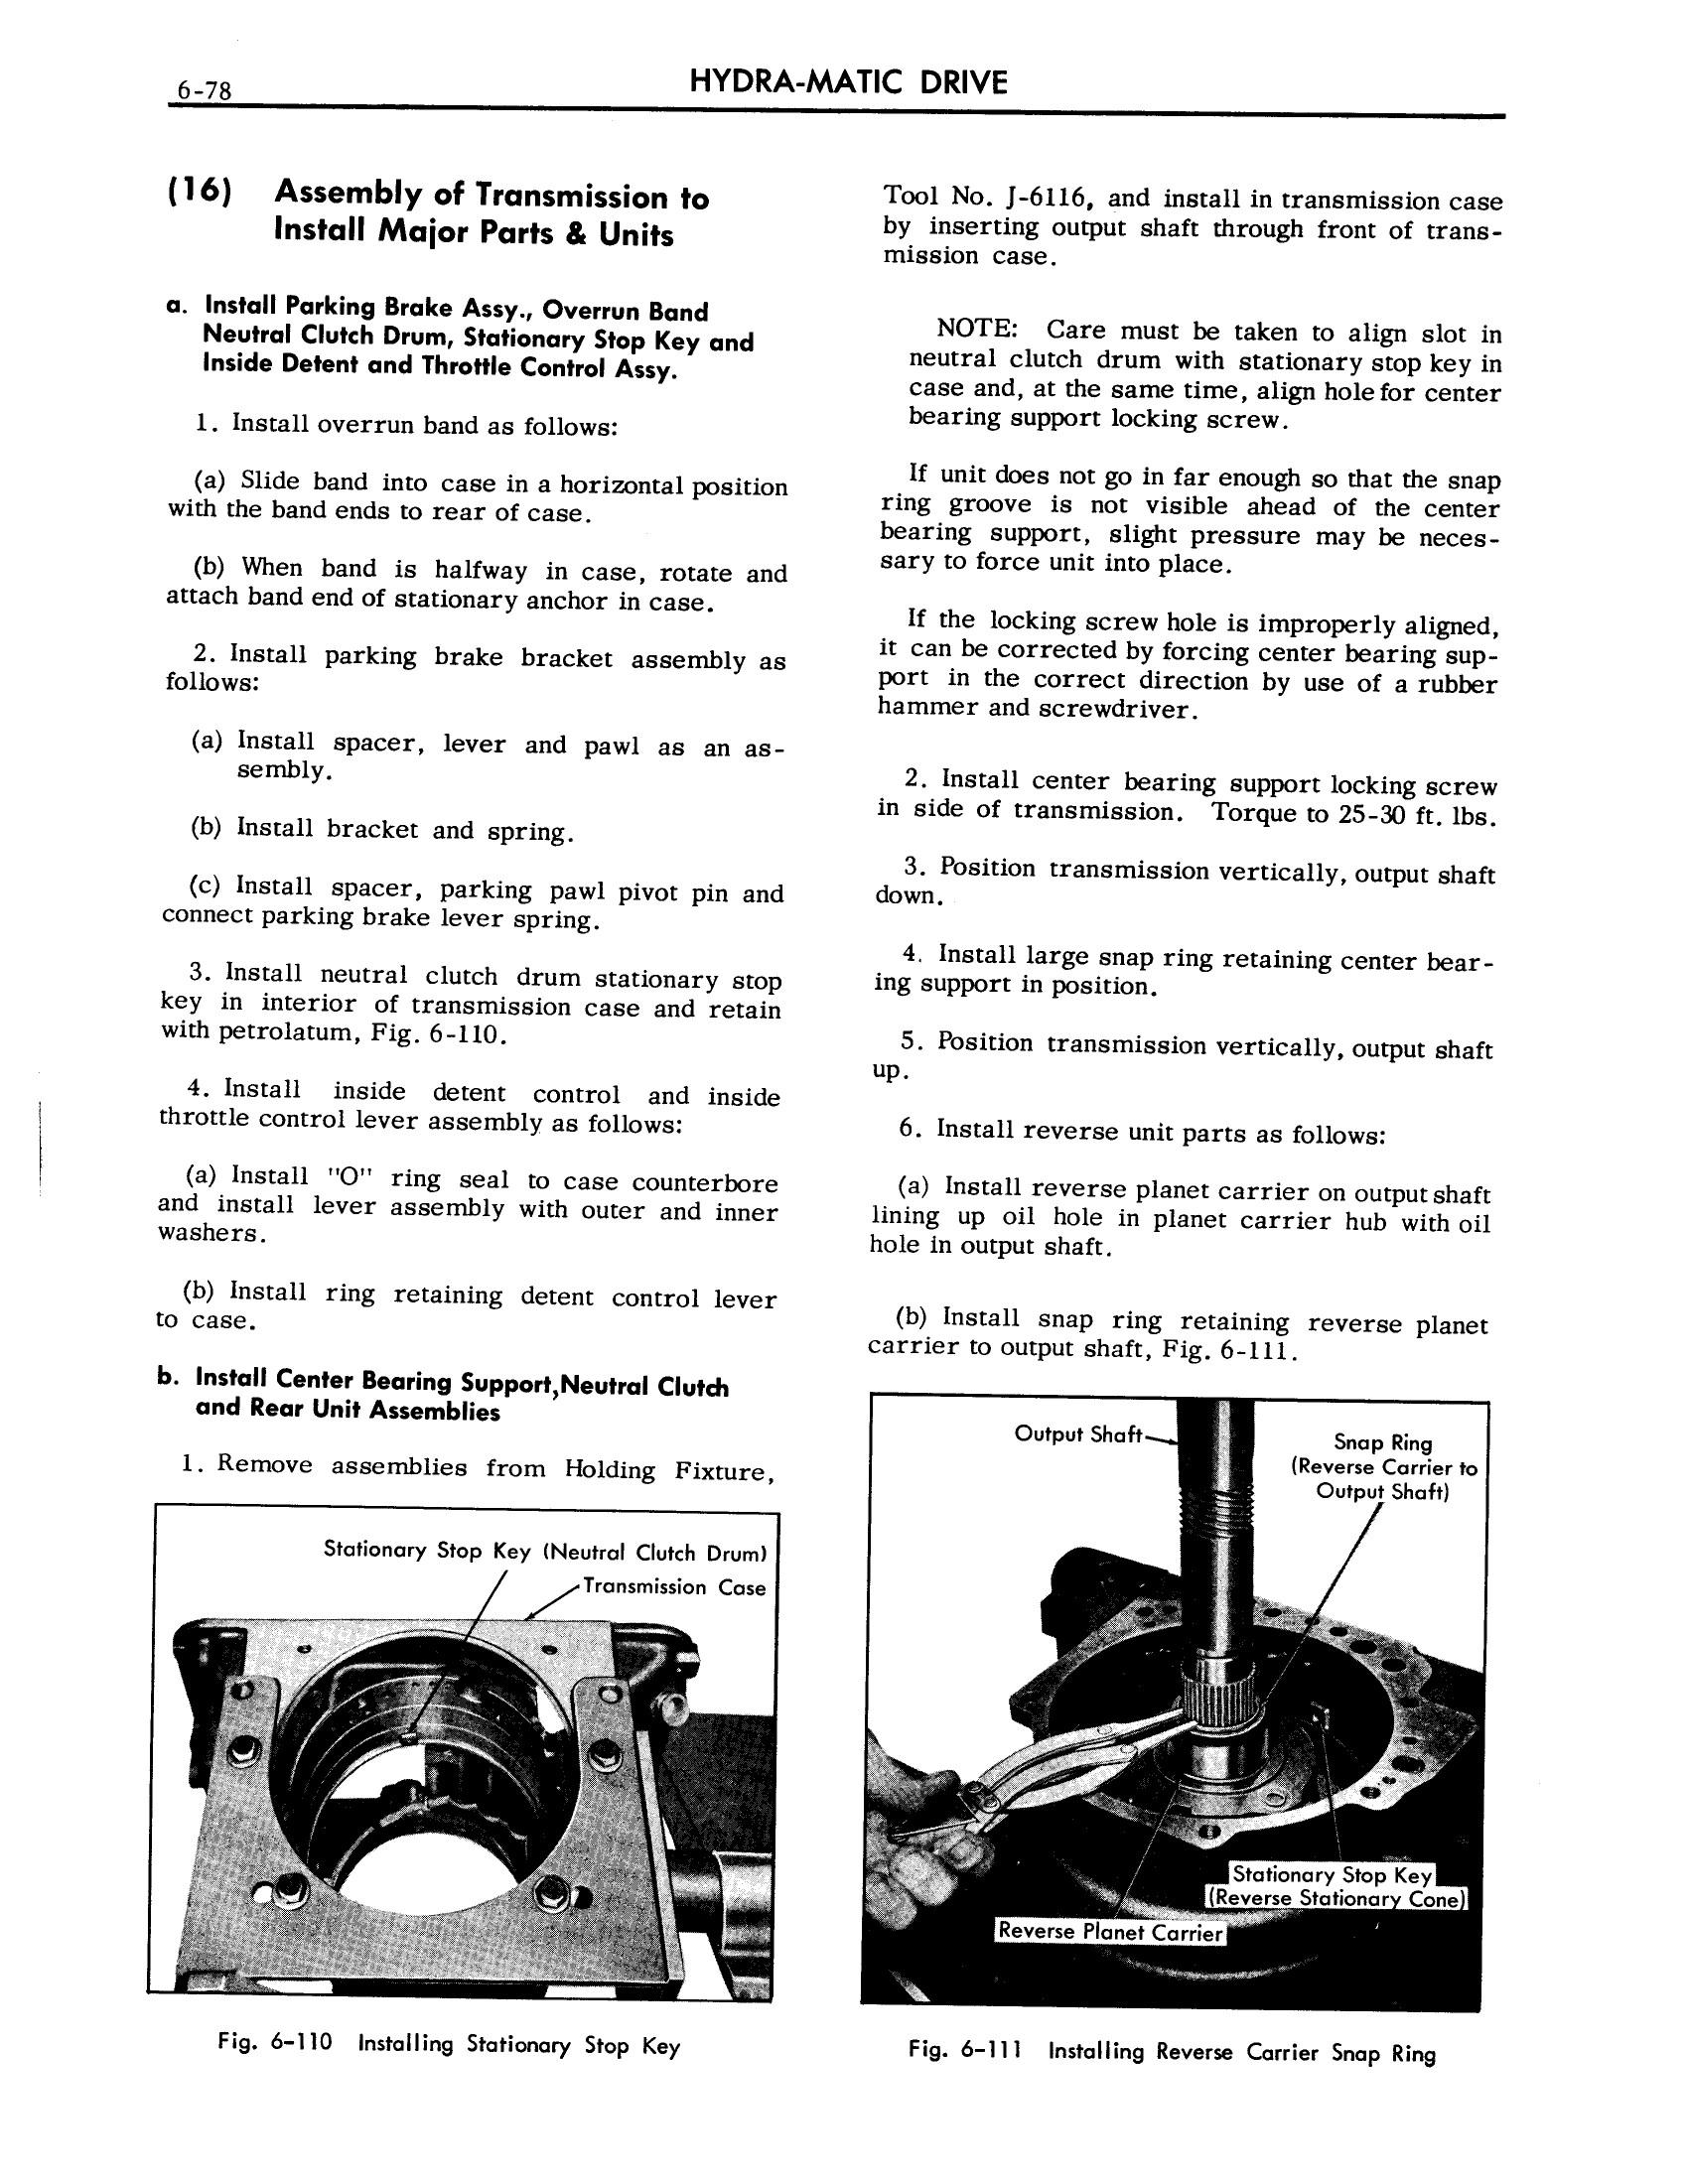 1957 Cadillac Shop Manual- Hydra-Matic Page 78 of 84